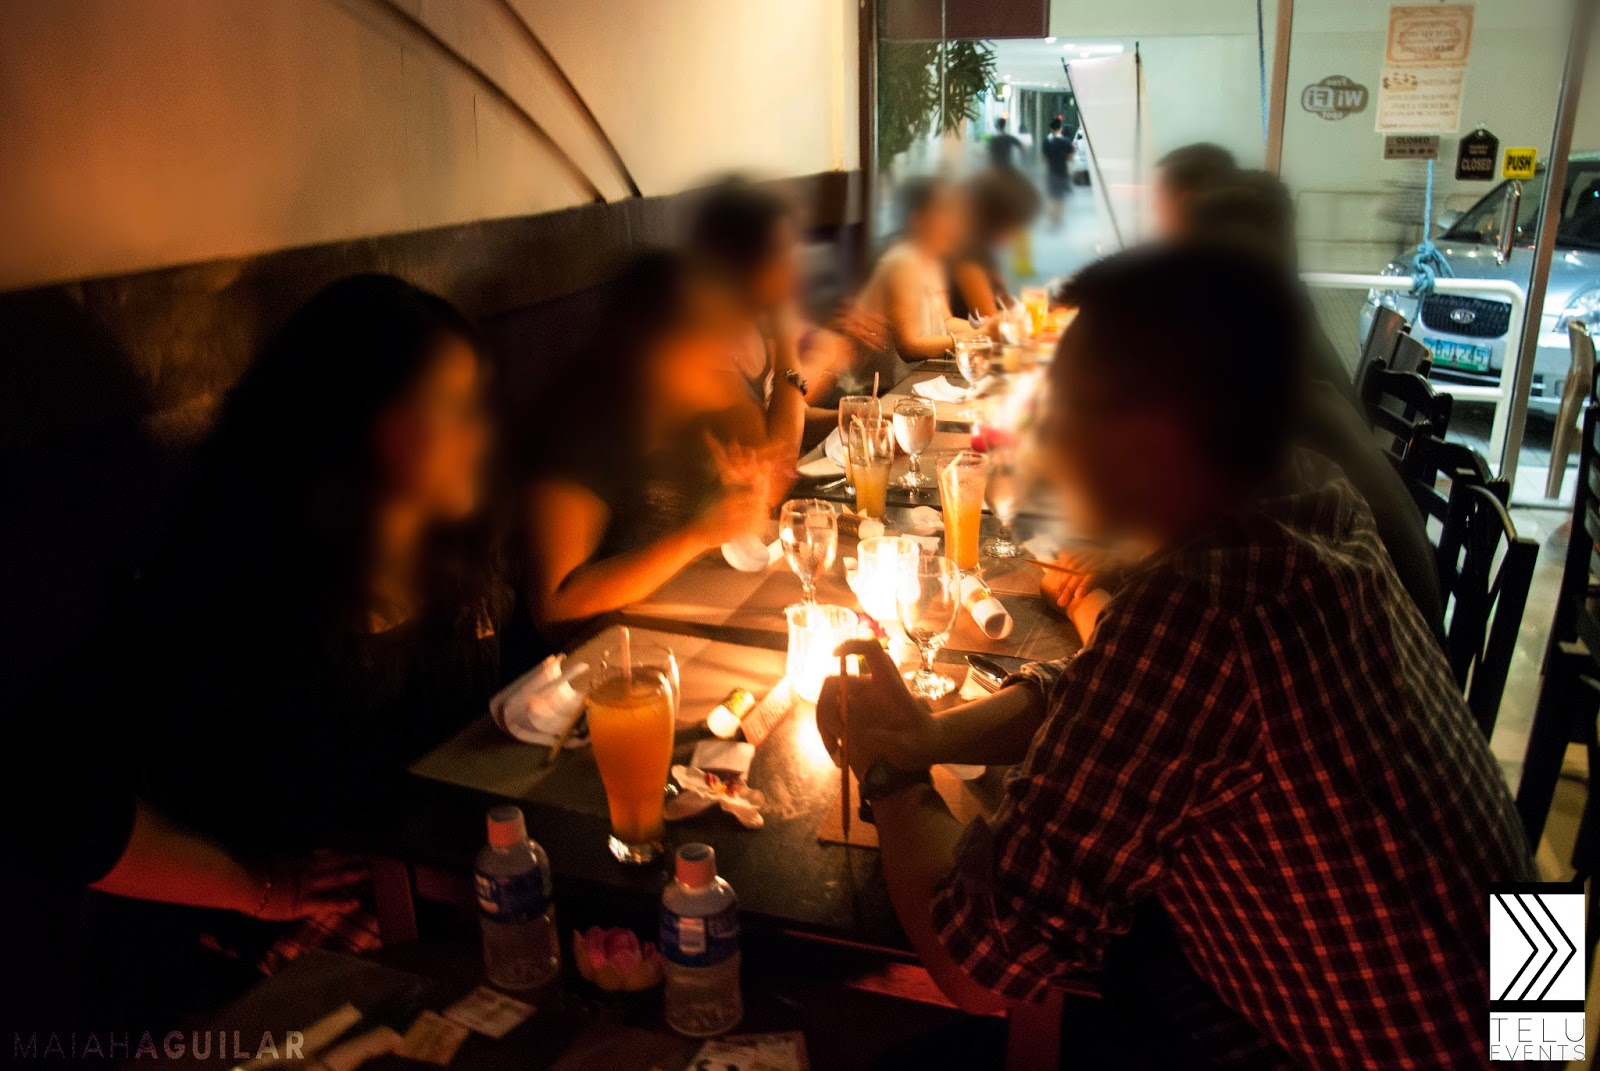 telu events speed dating